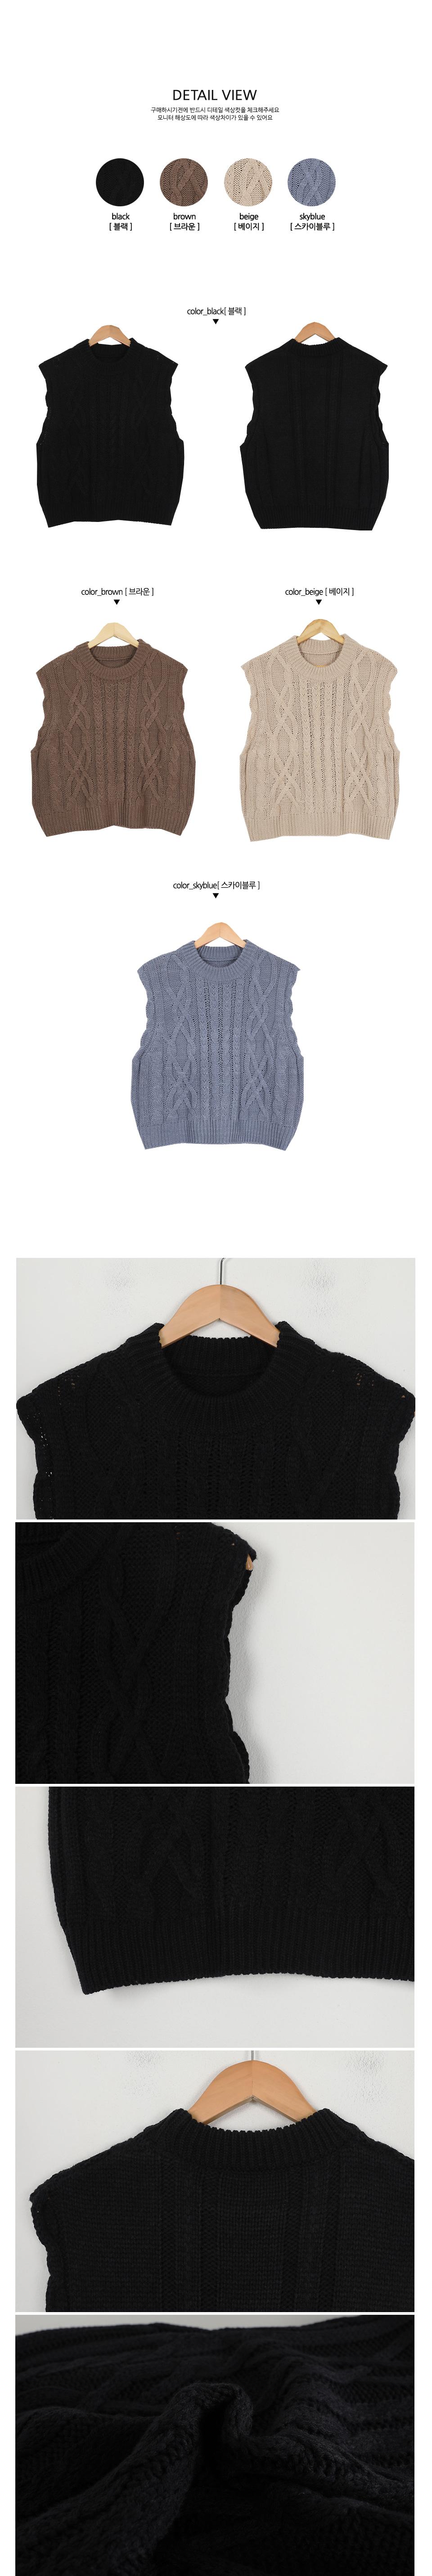 Bunny Knit Pretzel Vest